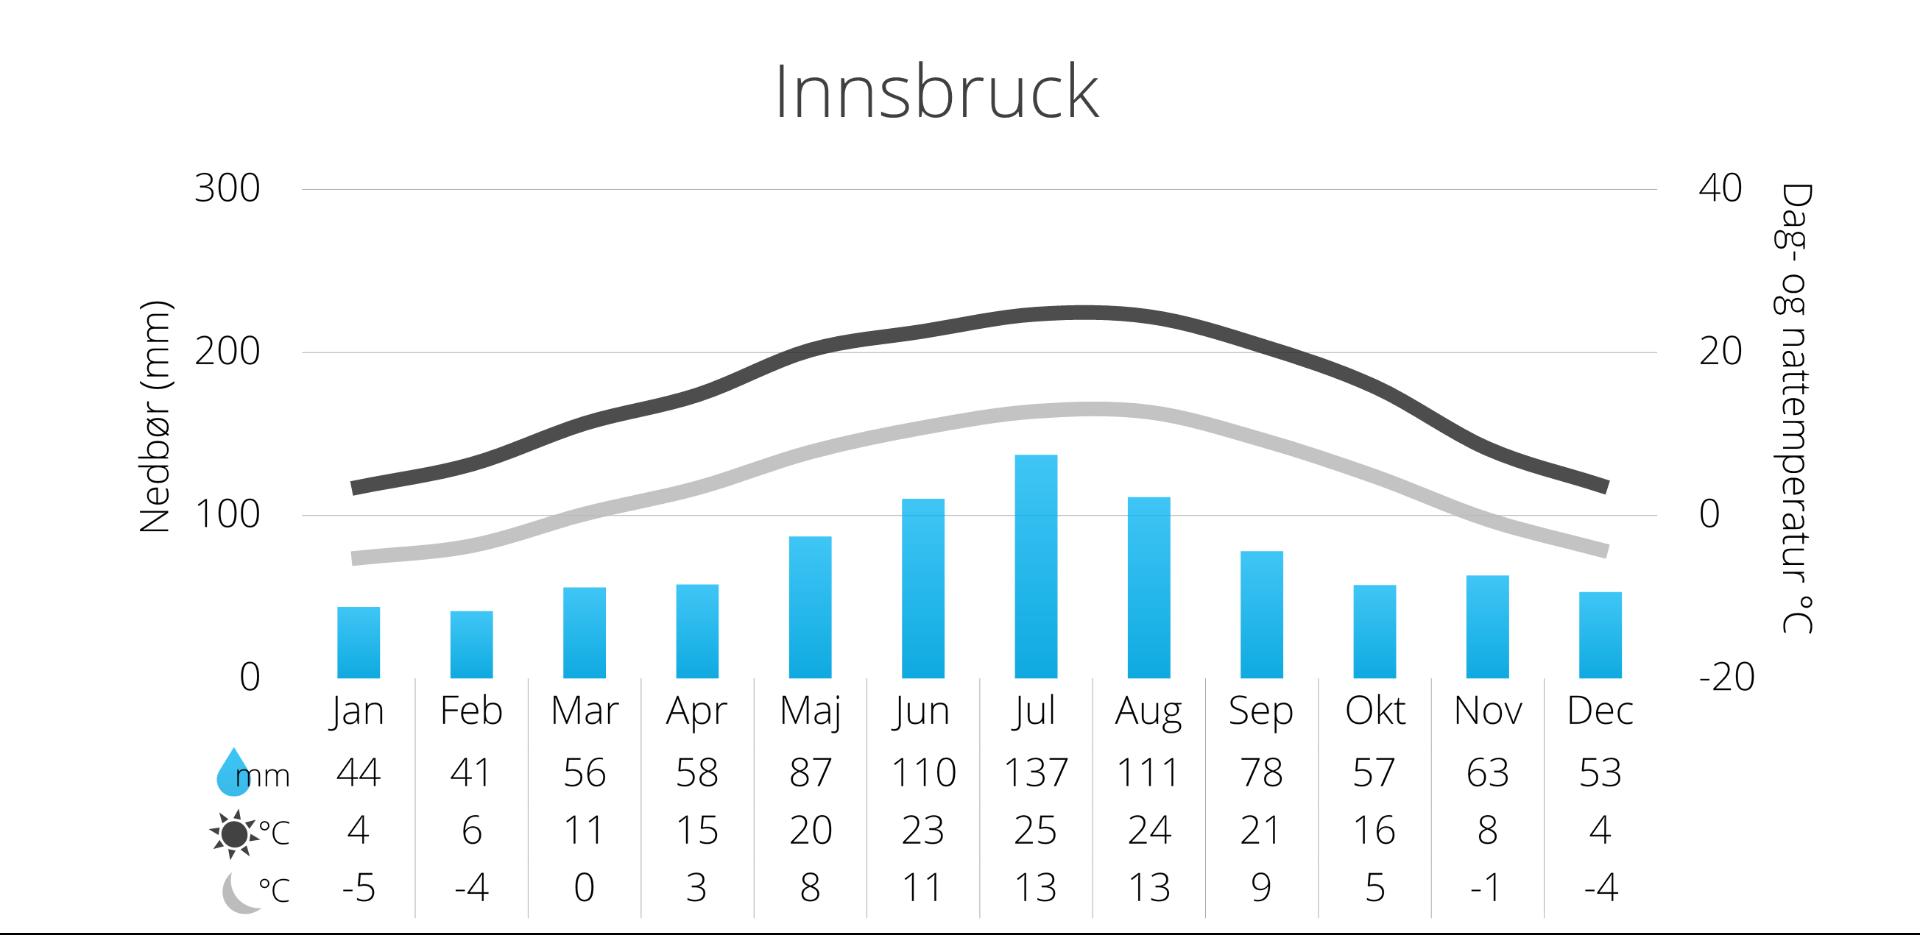 Vejrkort over Innsbruck